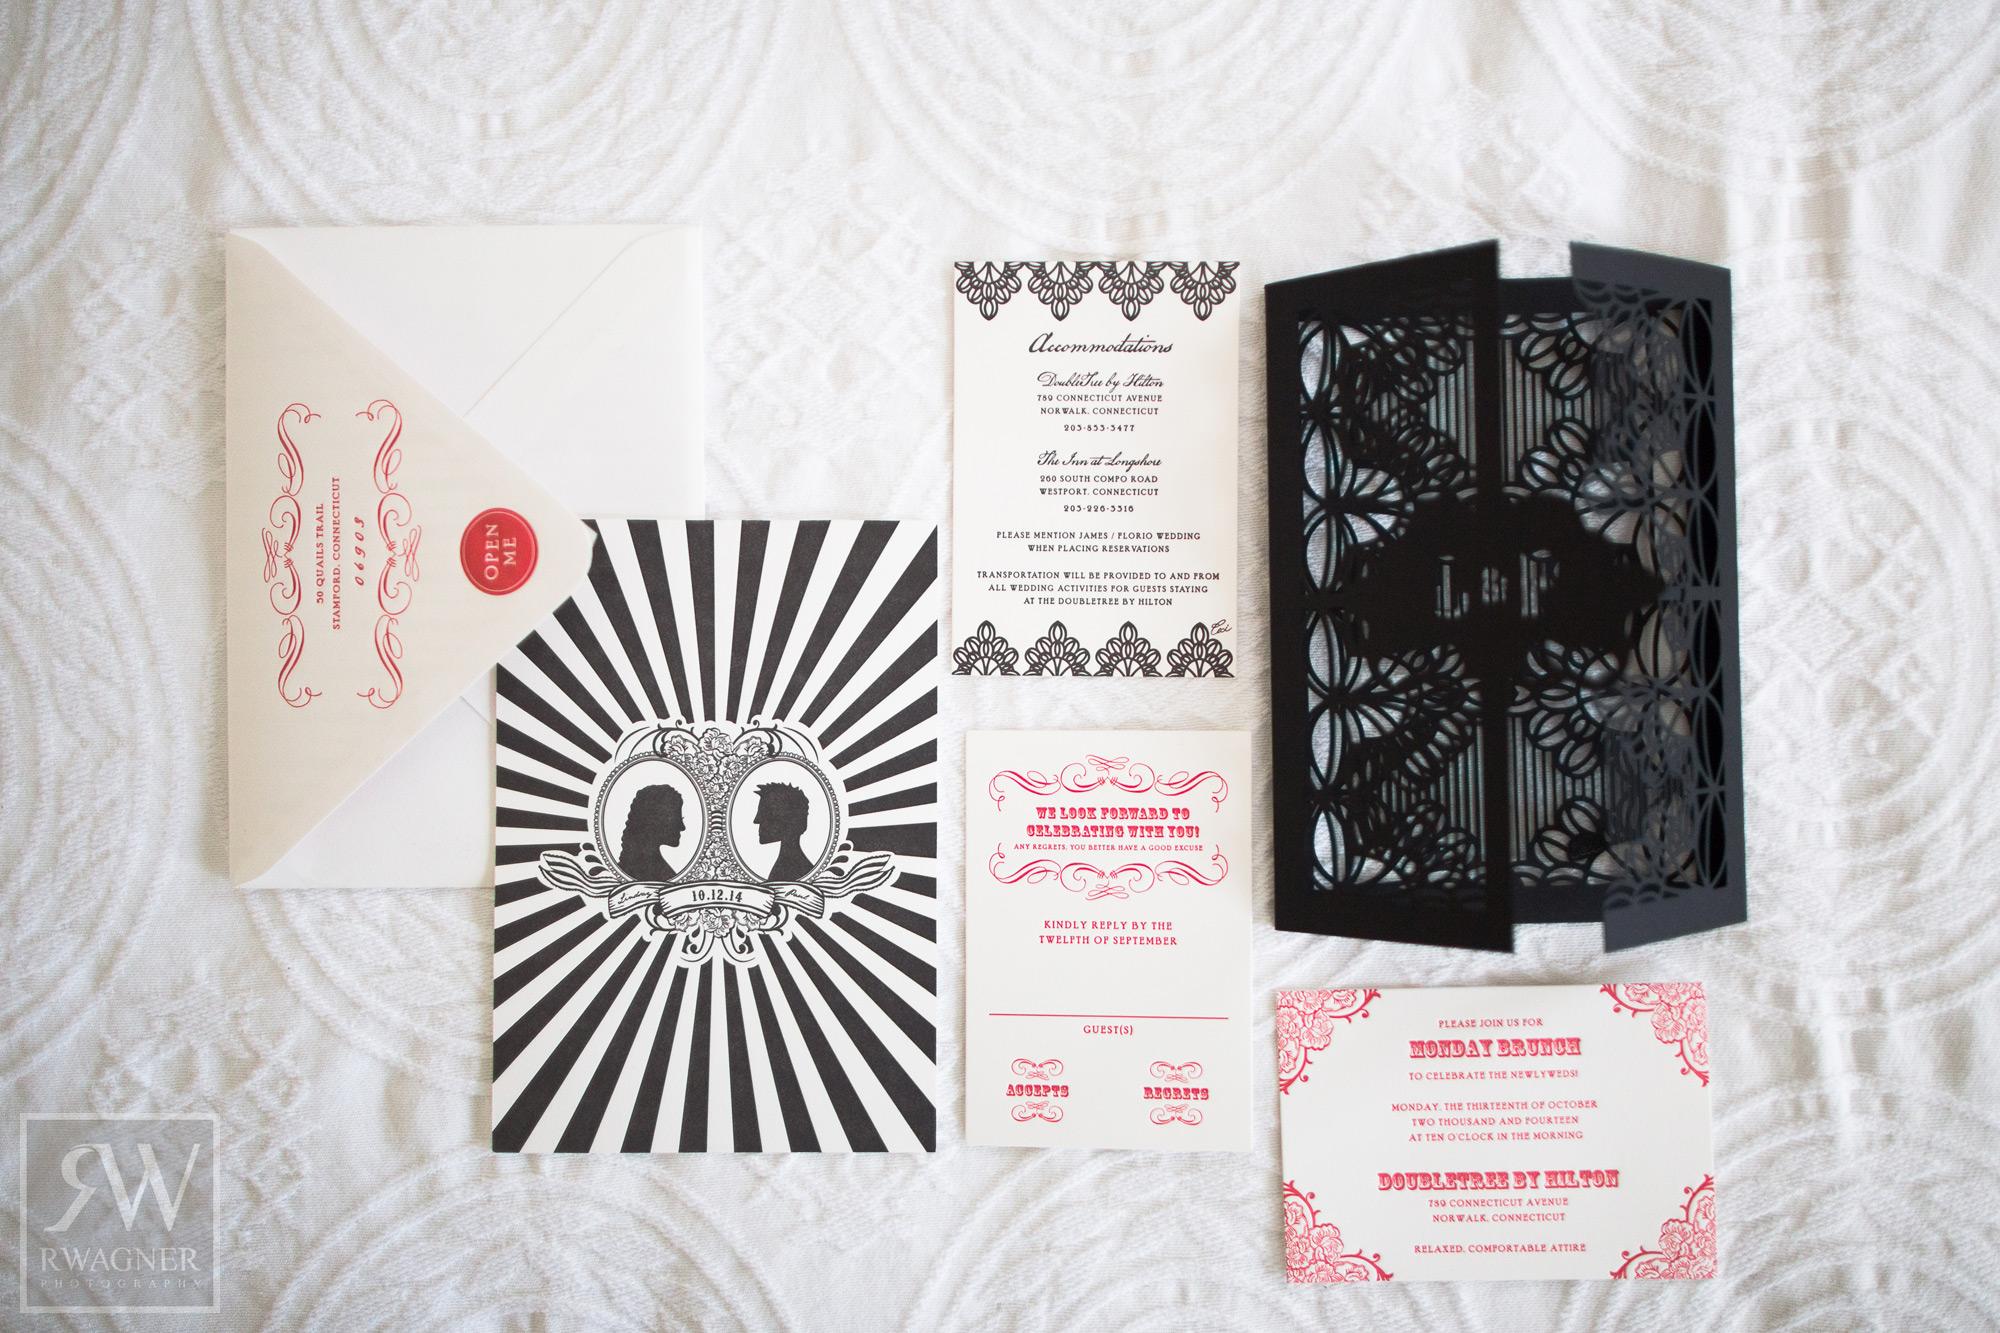 ceci_new_york_luxury_wedding_invitations_couture_red_black_white_real_wedding_dramatic_inn_at_longshore_v286_4.jpg